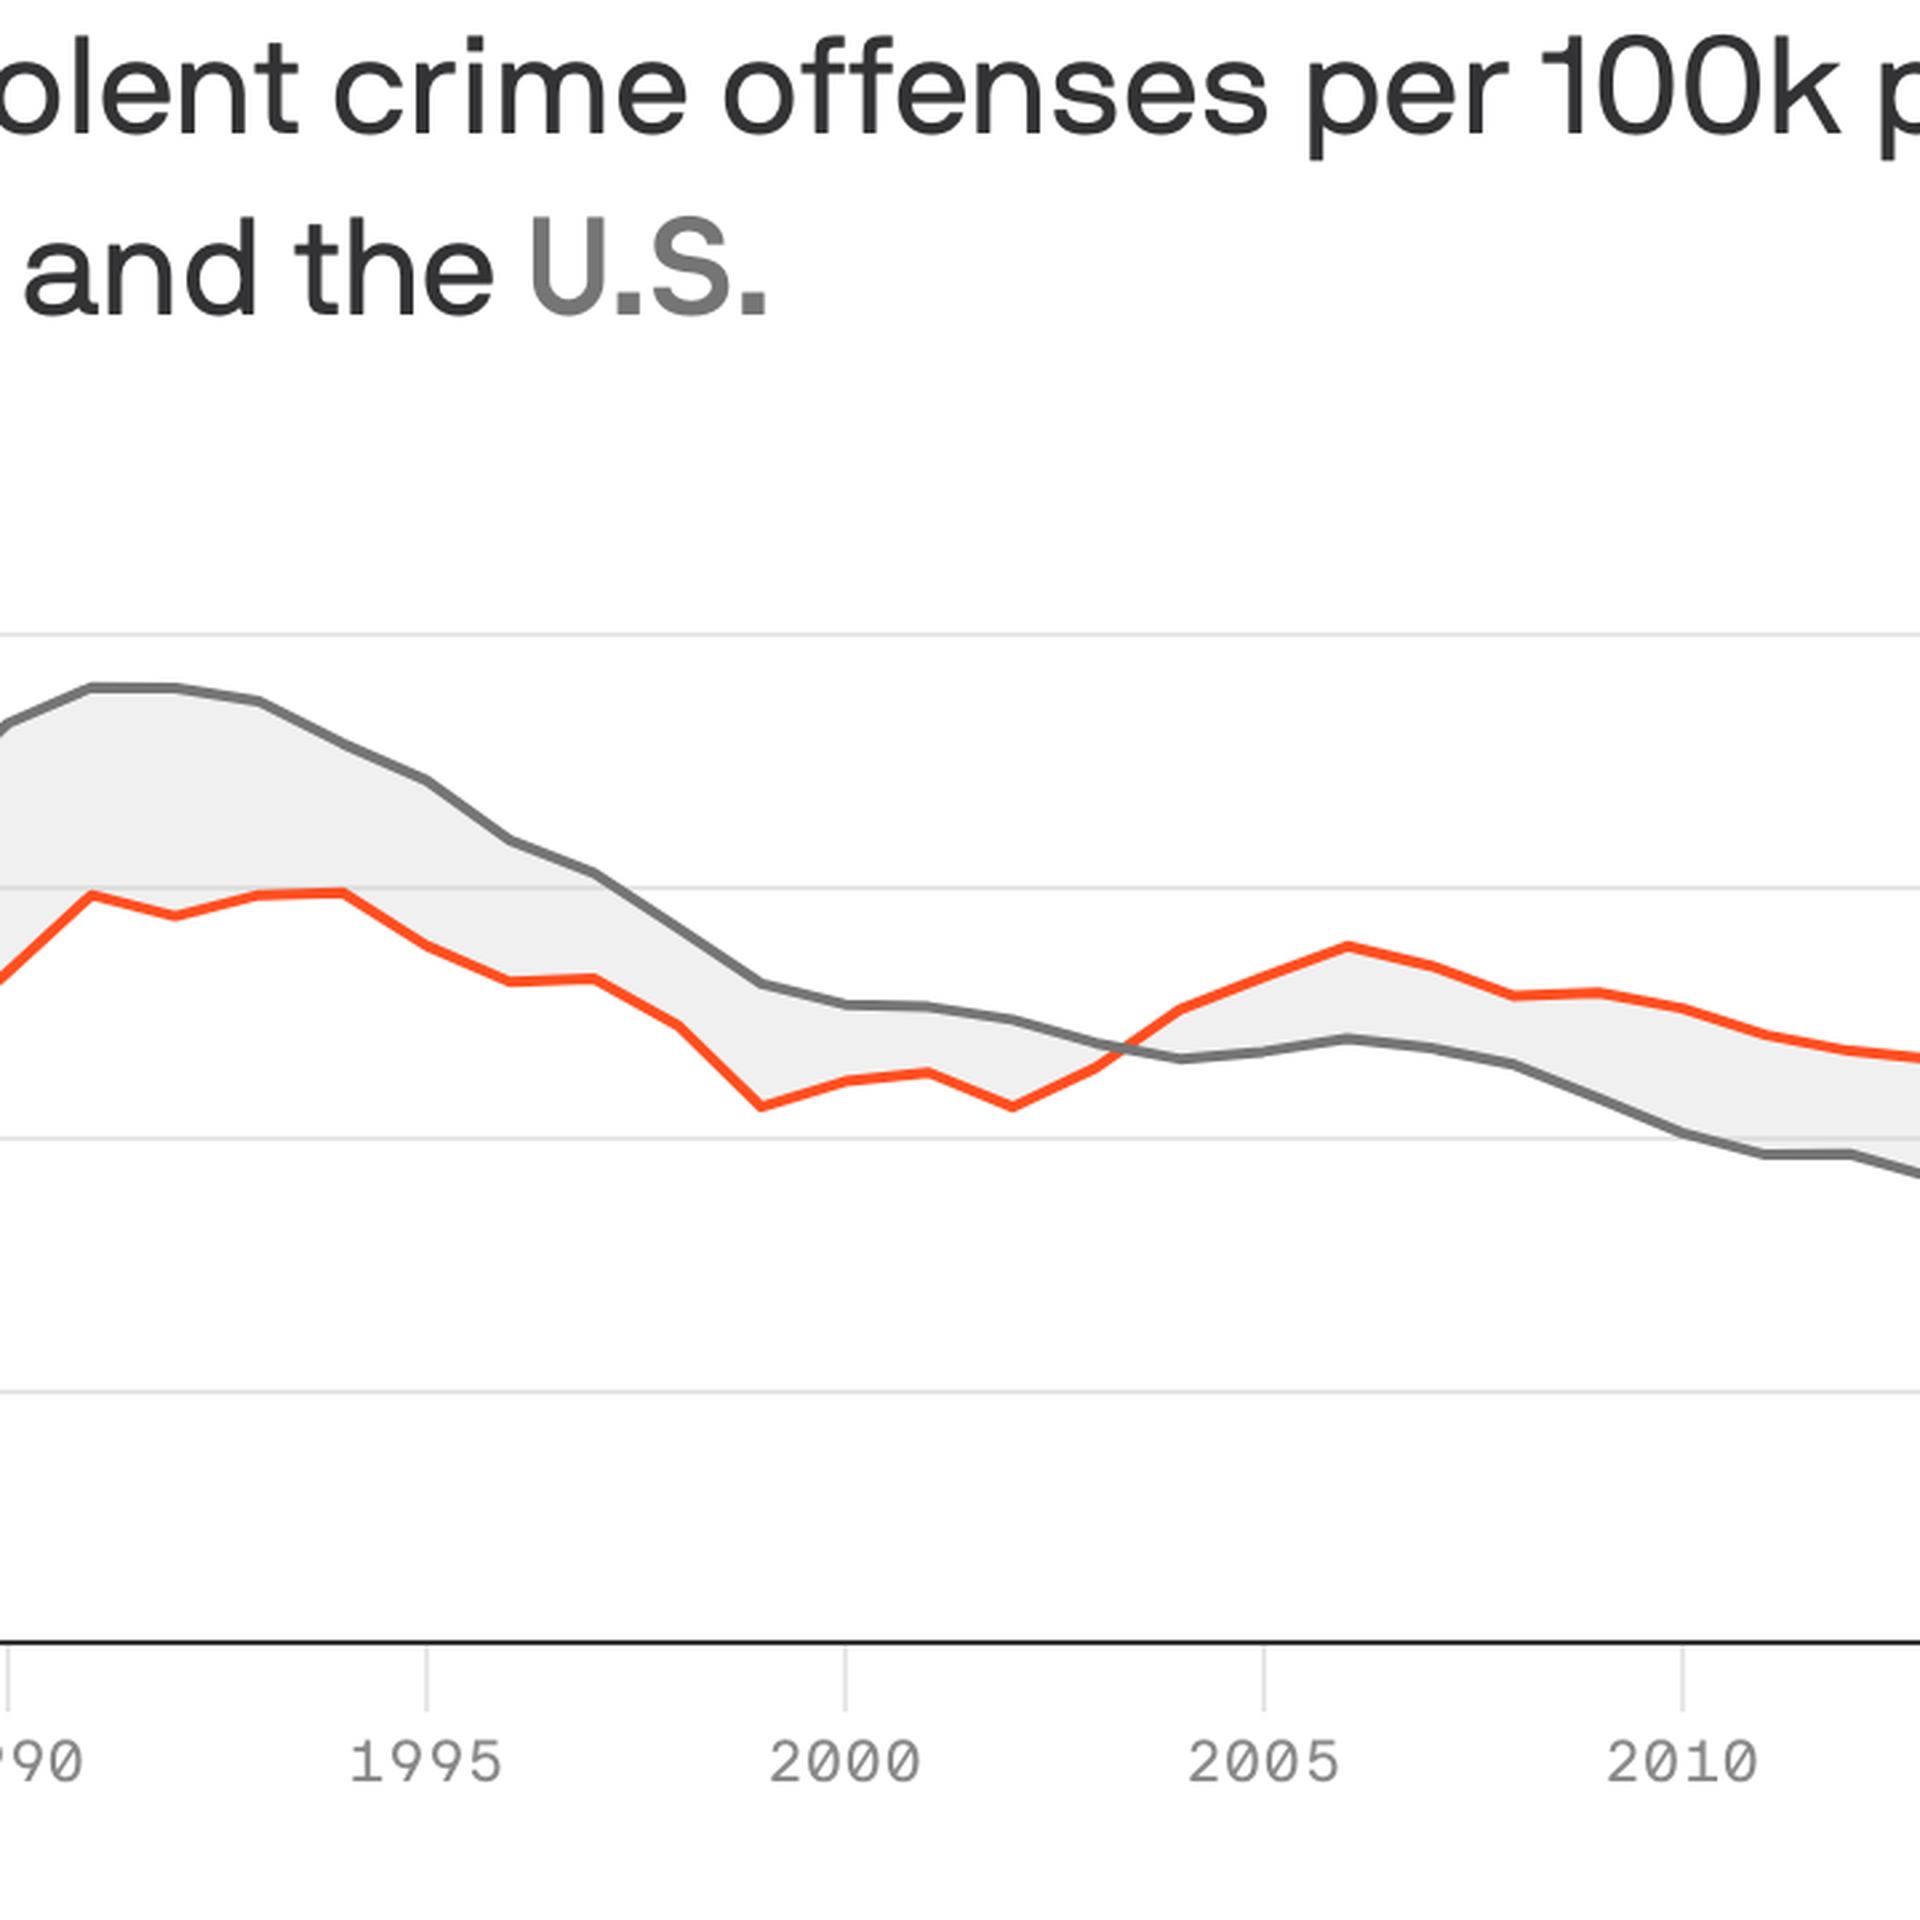 Violent crimes in Arkansas